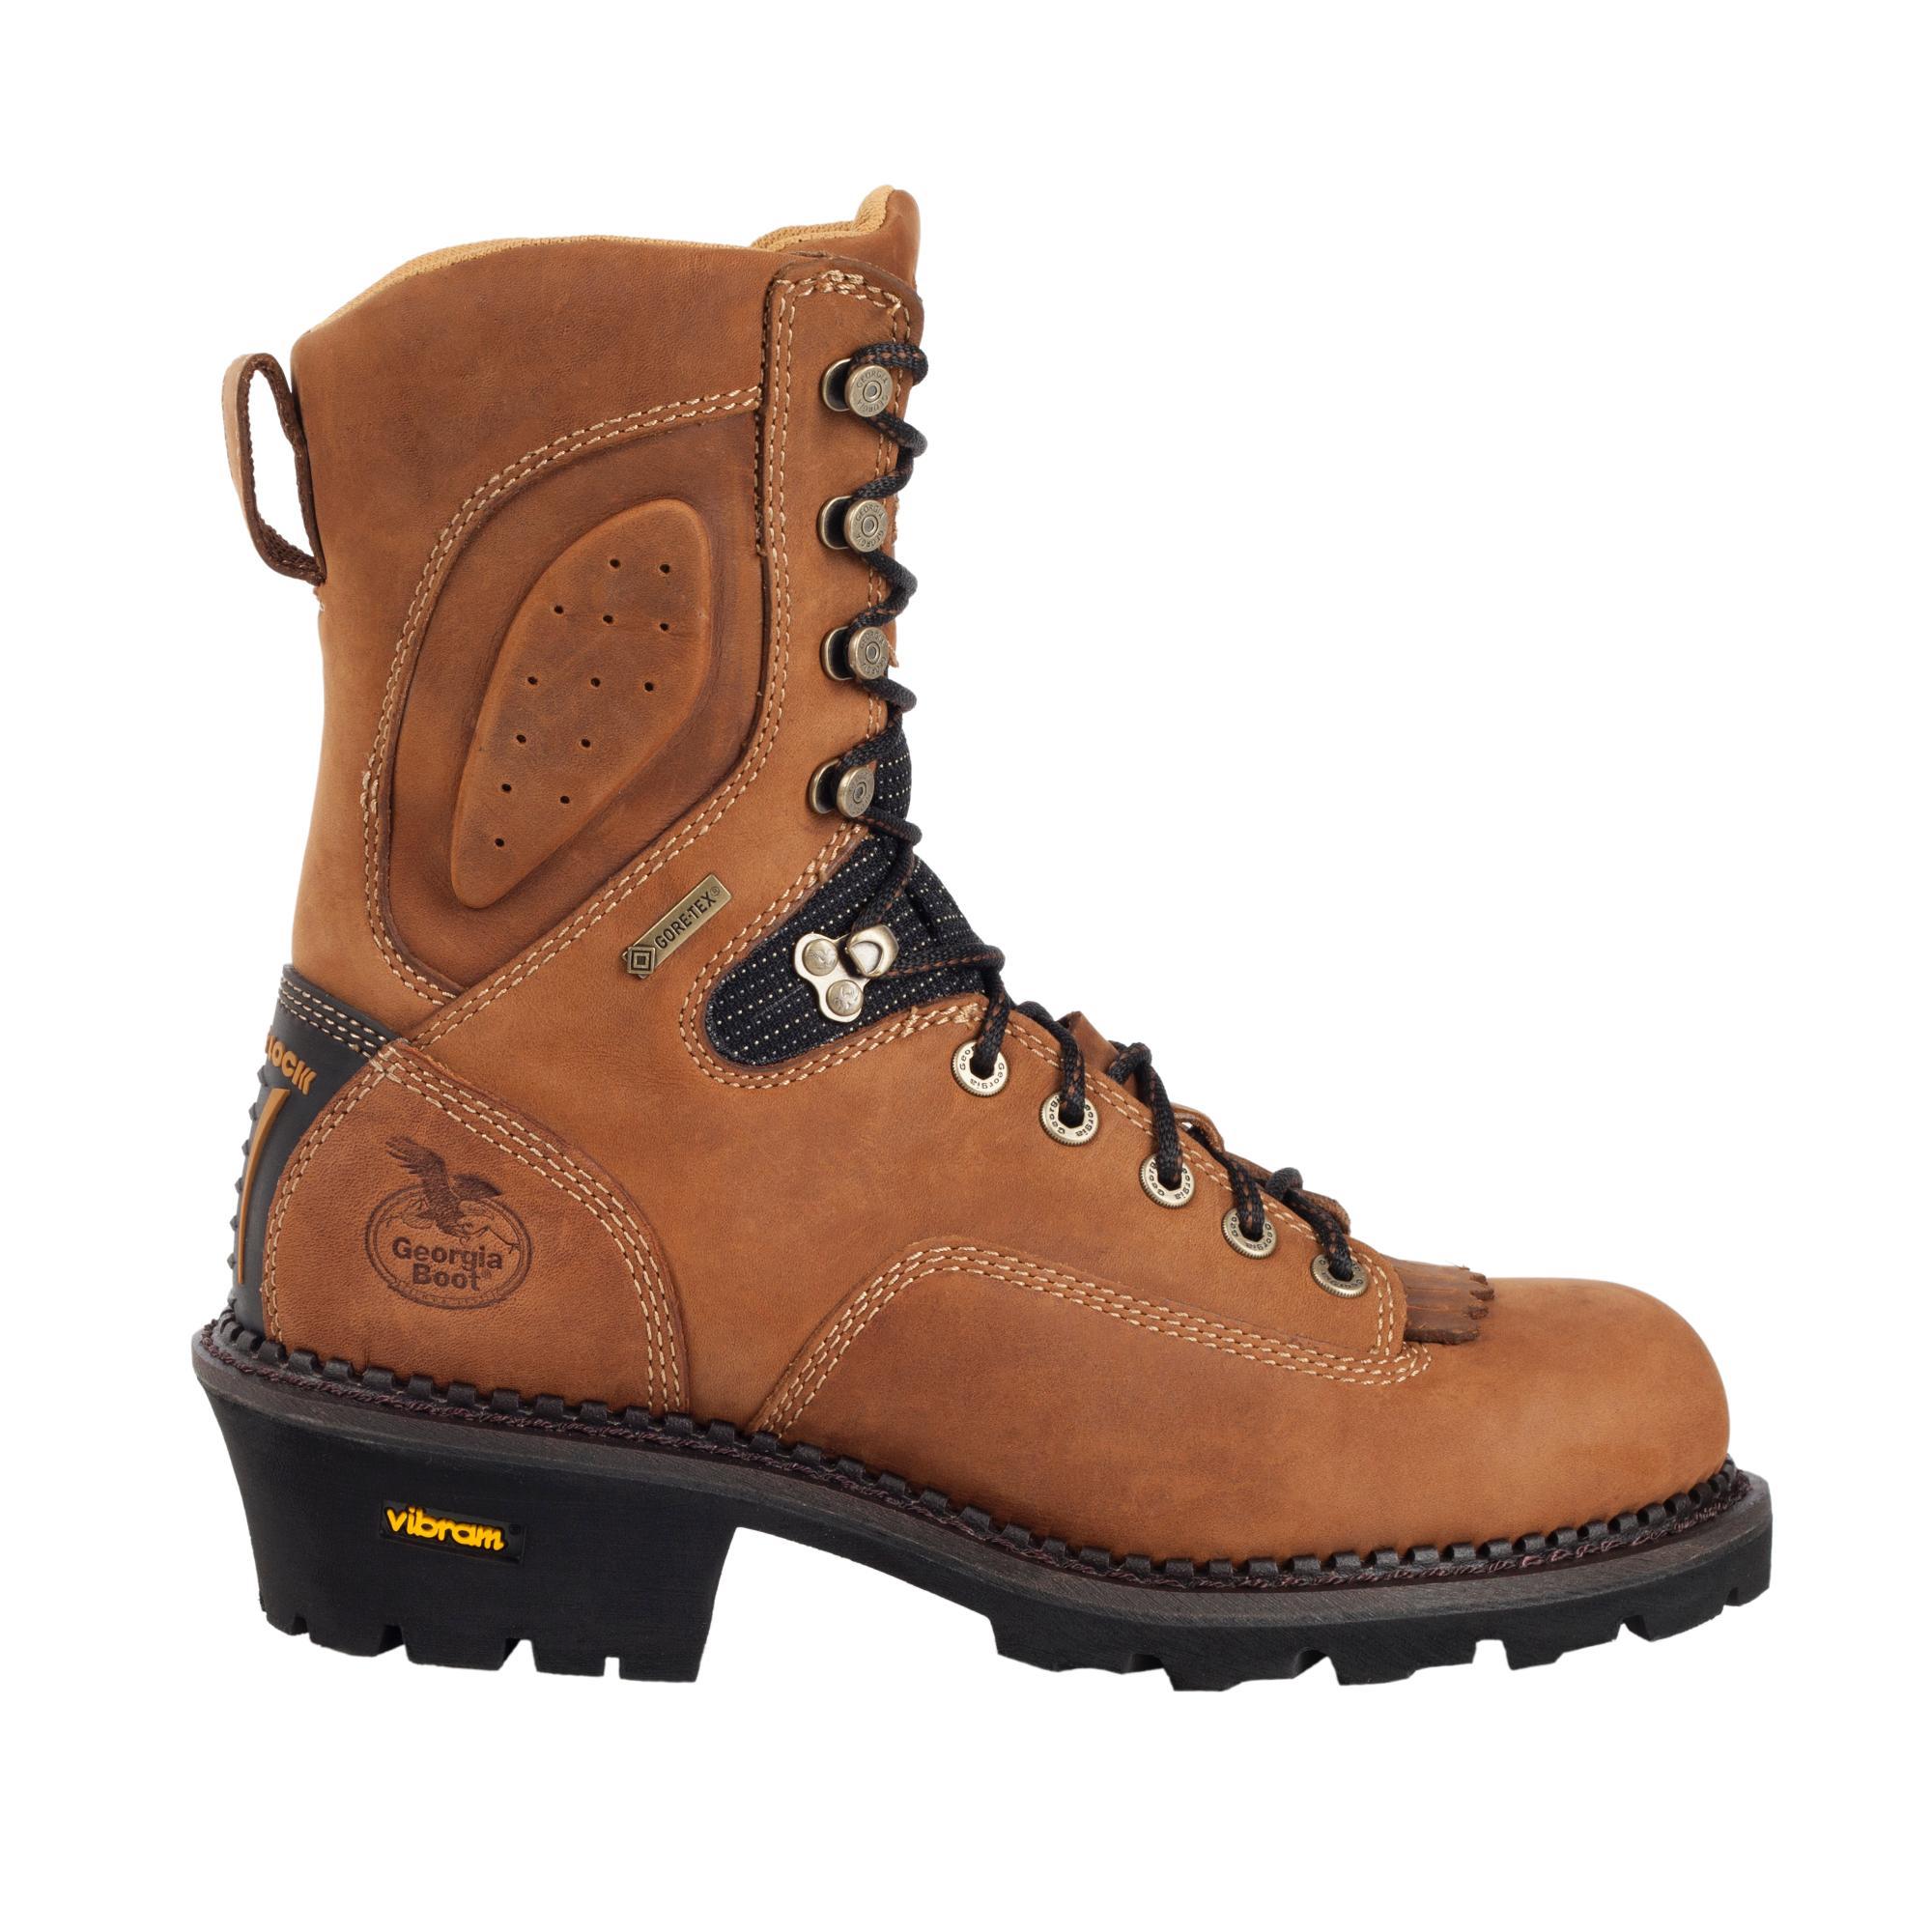 boot walker protective comfort sizes all boots asp dog care comforter quantity trixie xxx shoes pks p size large